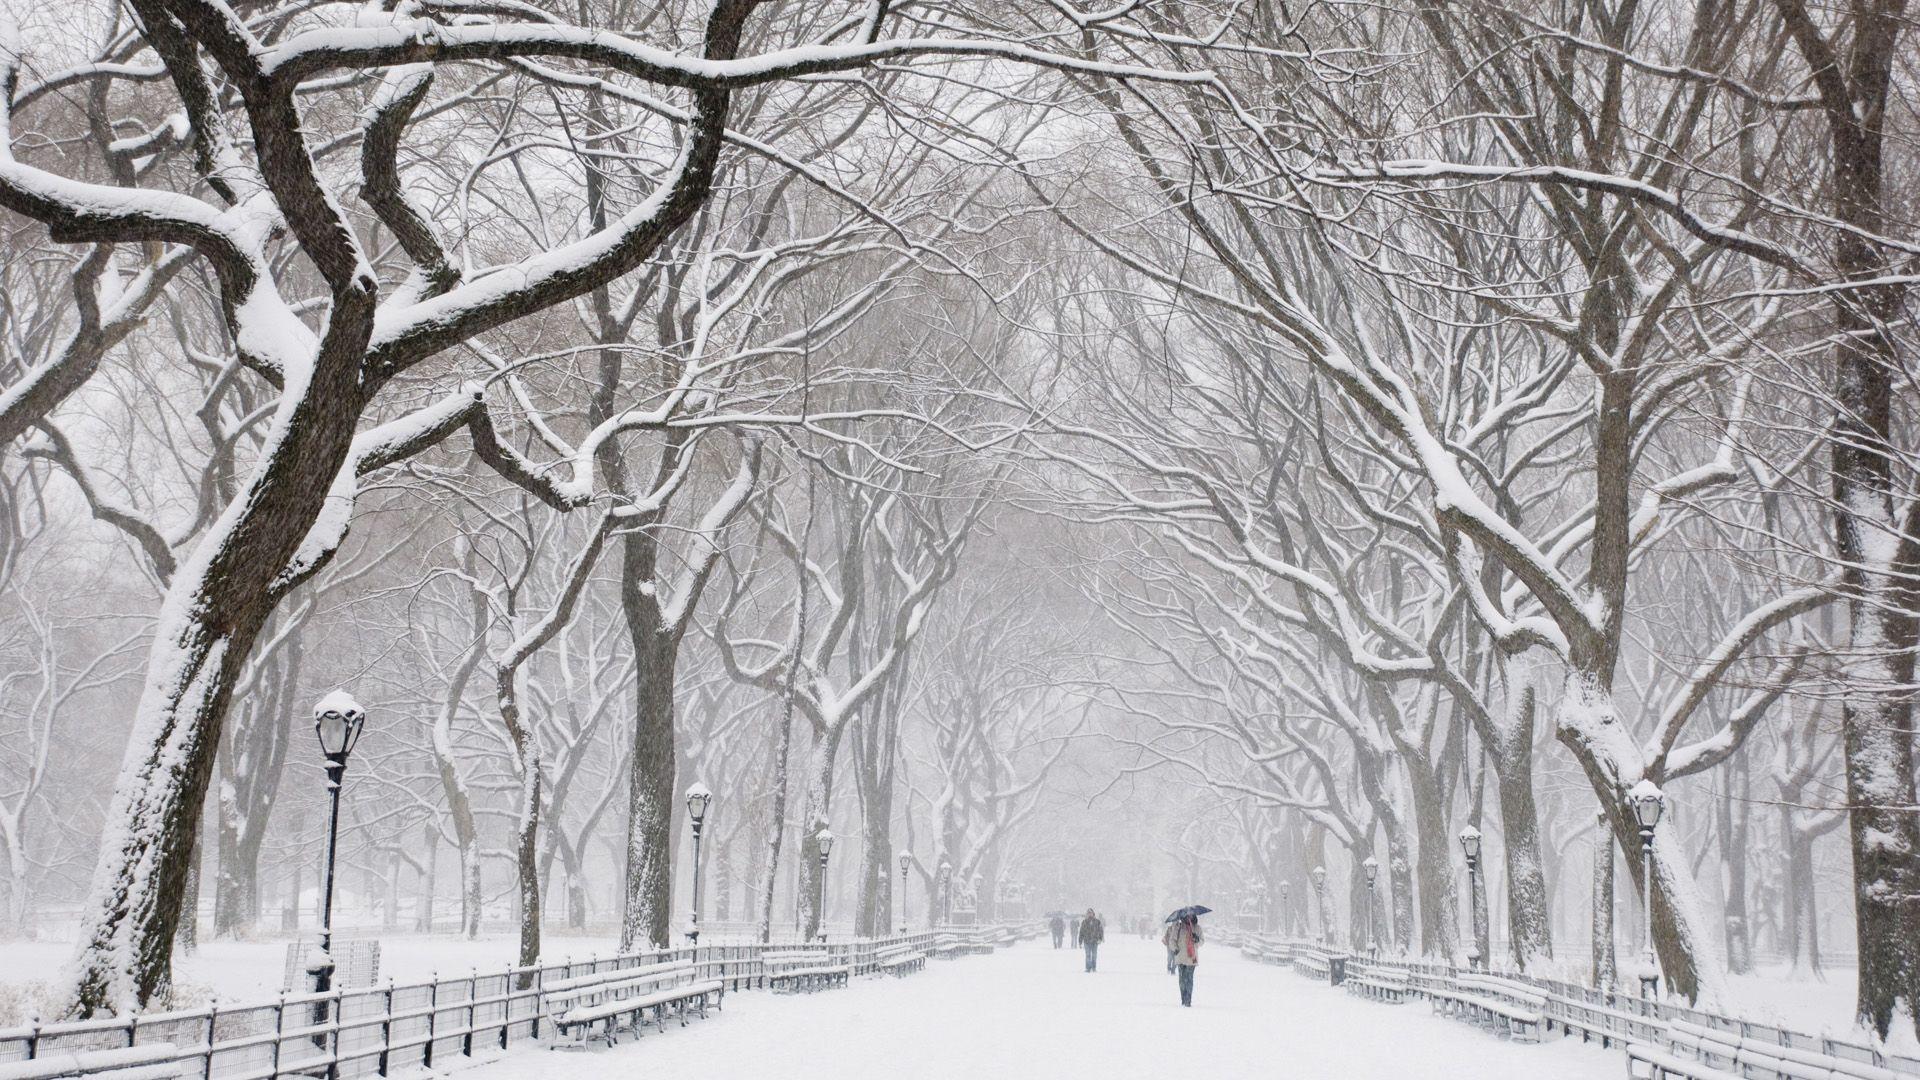 Snow Covered Trees Central Park New York Tempete De Neige Neige Fond D Ecran Telephone